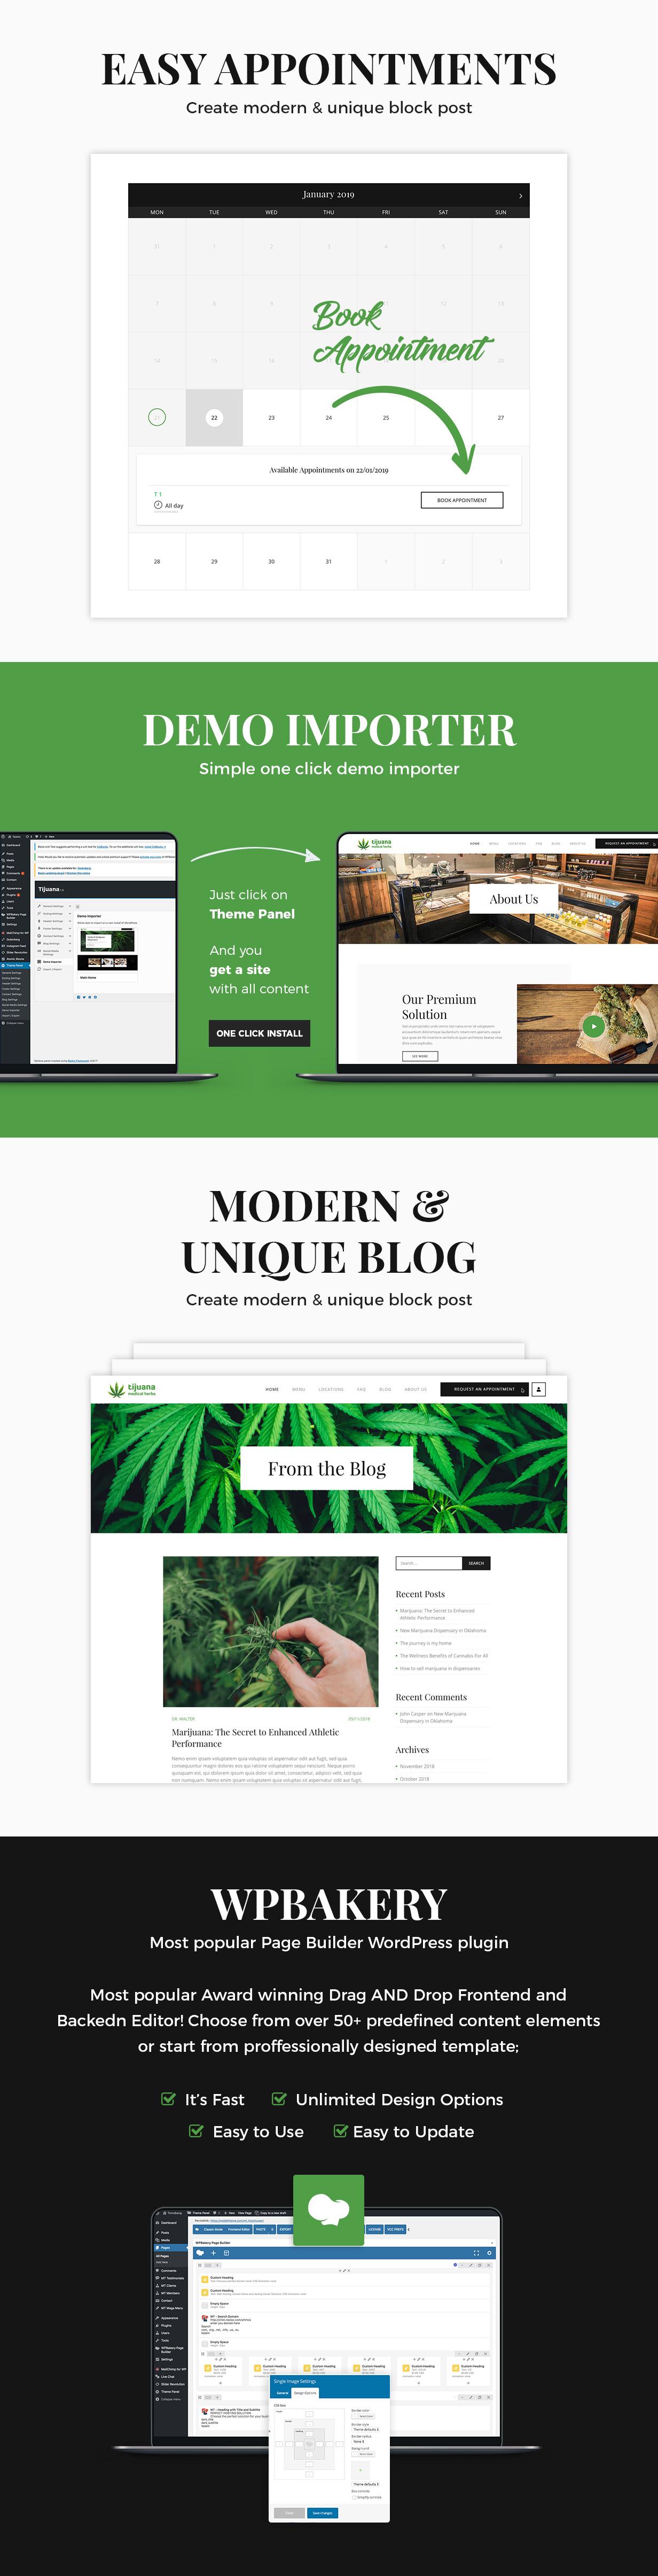 Tijuana - Marijuana Dispensary & Medical WordPress Theme - 4